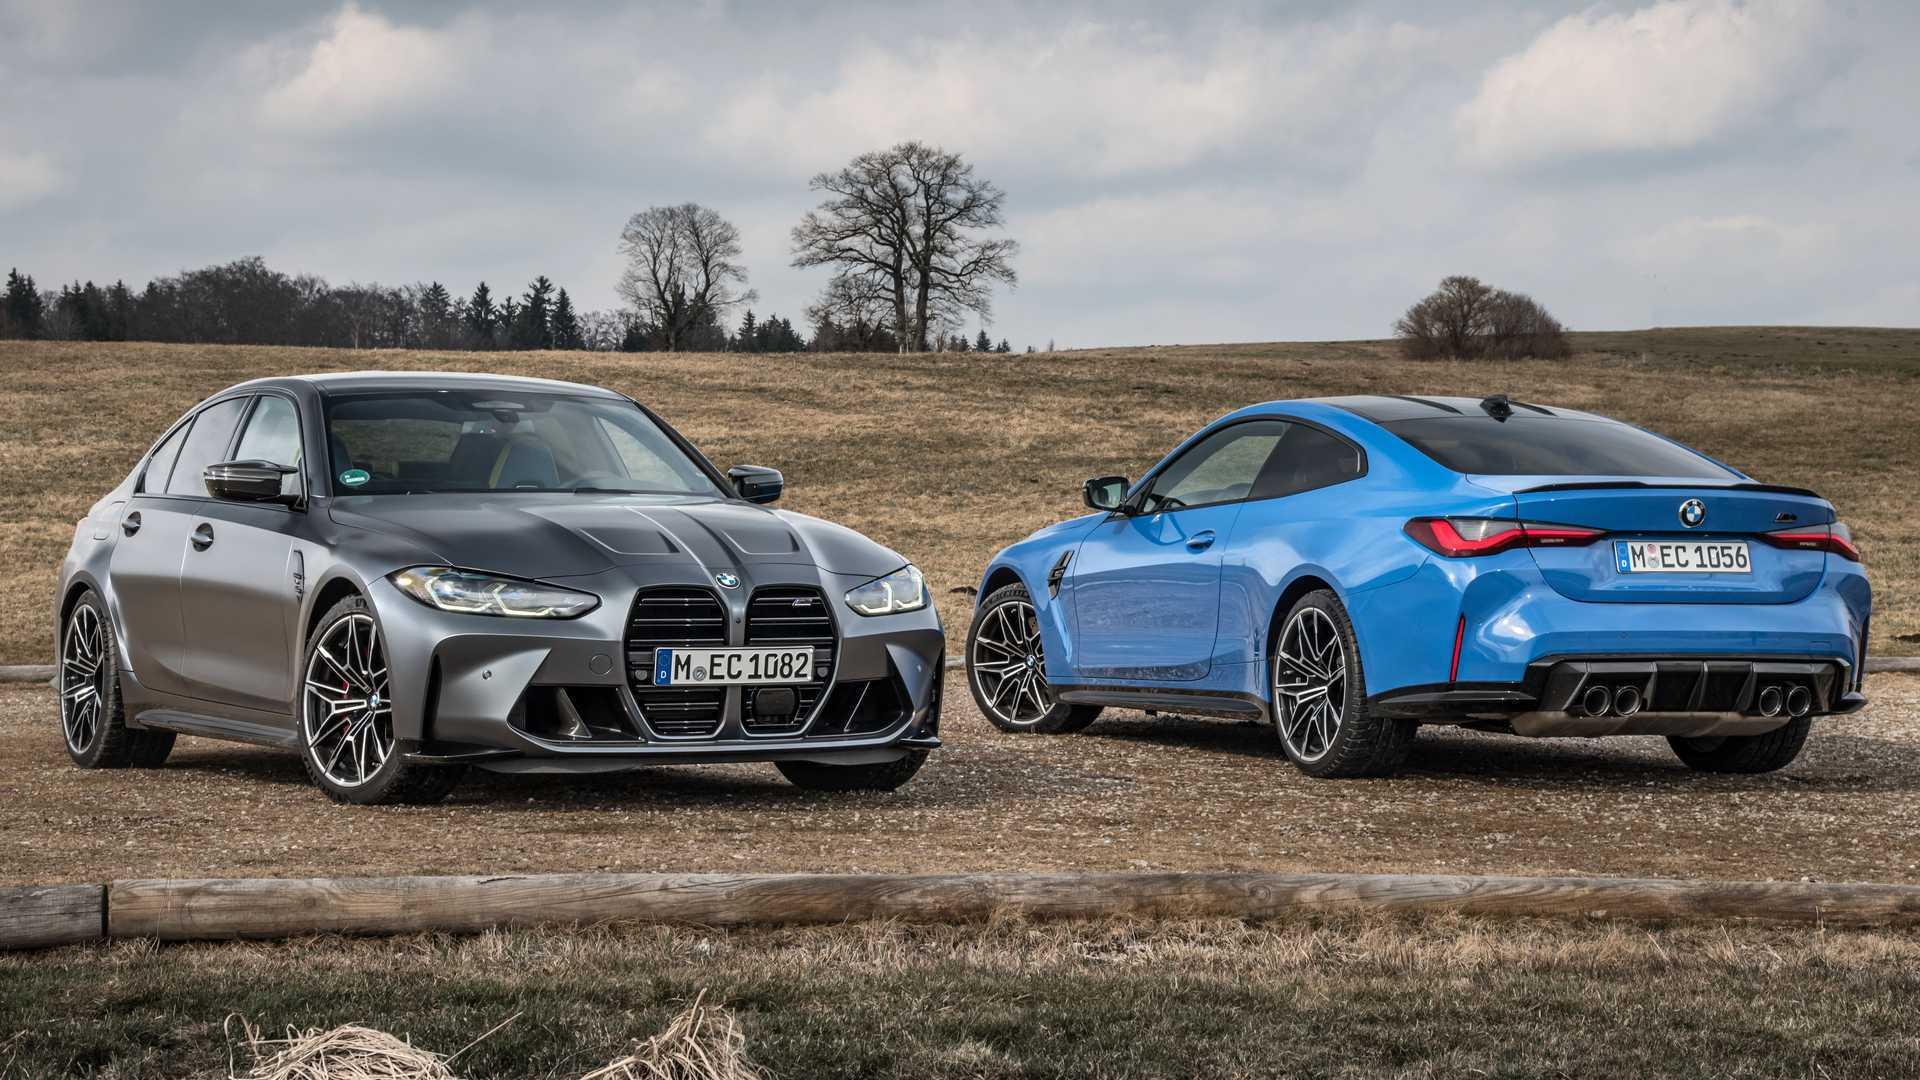 Nissan GT-R борется с Audi RS5 и BMW M4 xDrive в Drag Race